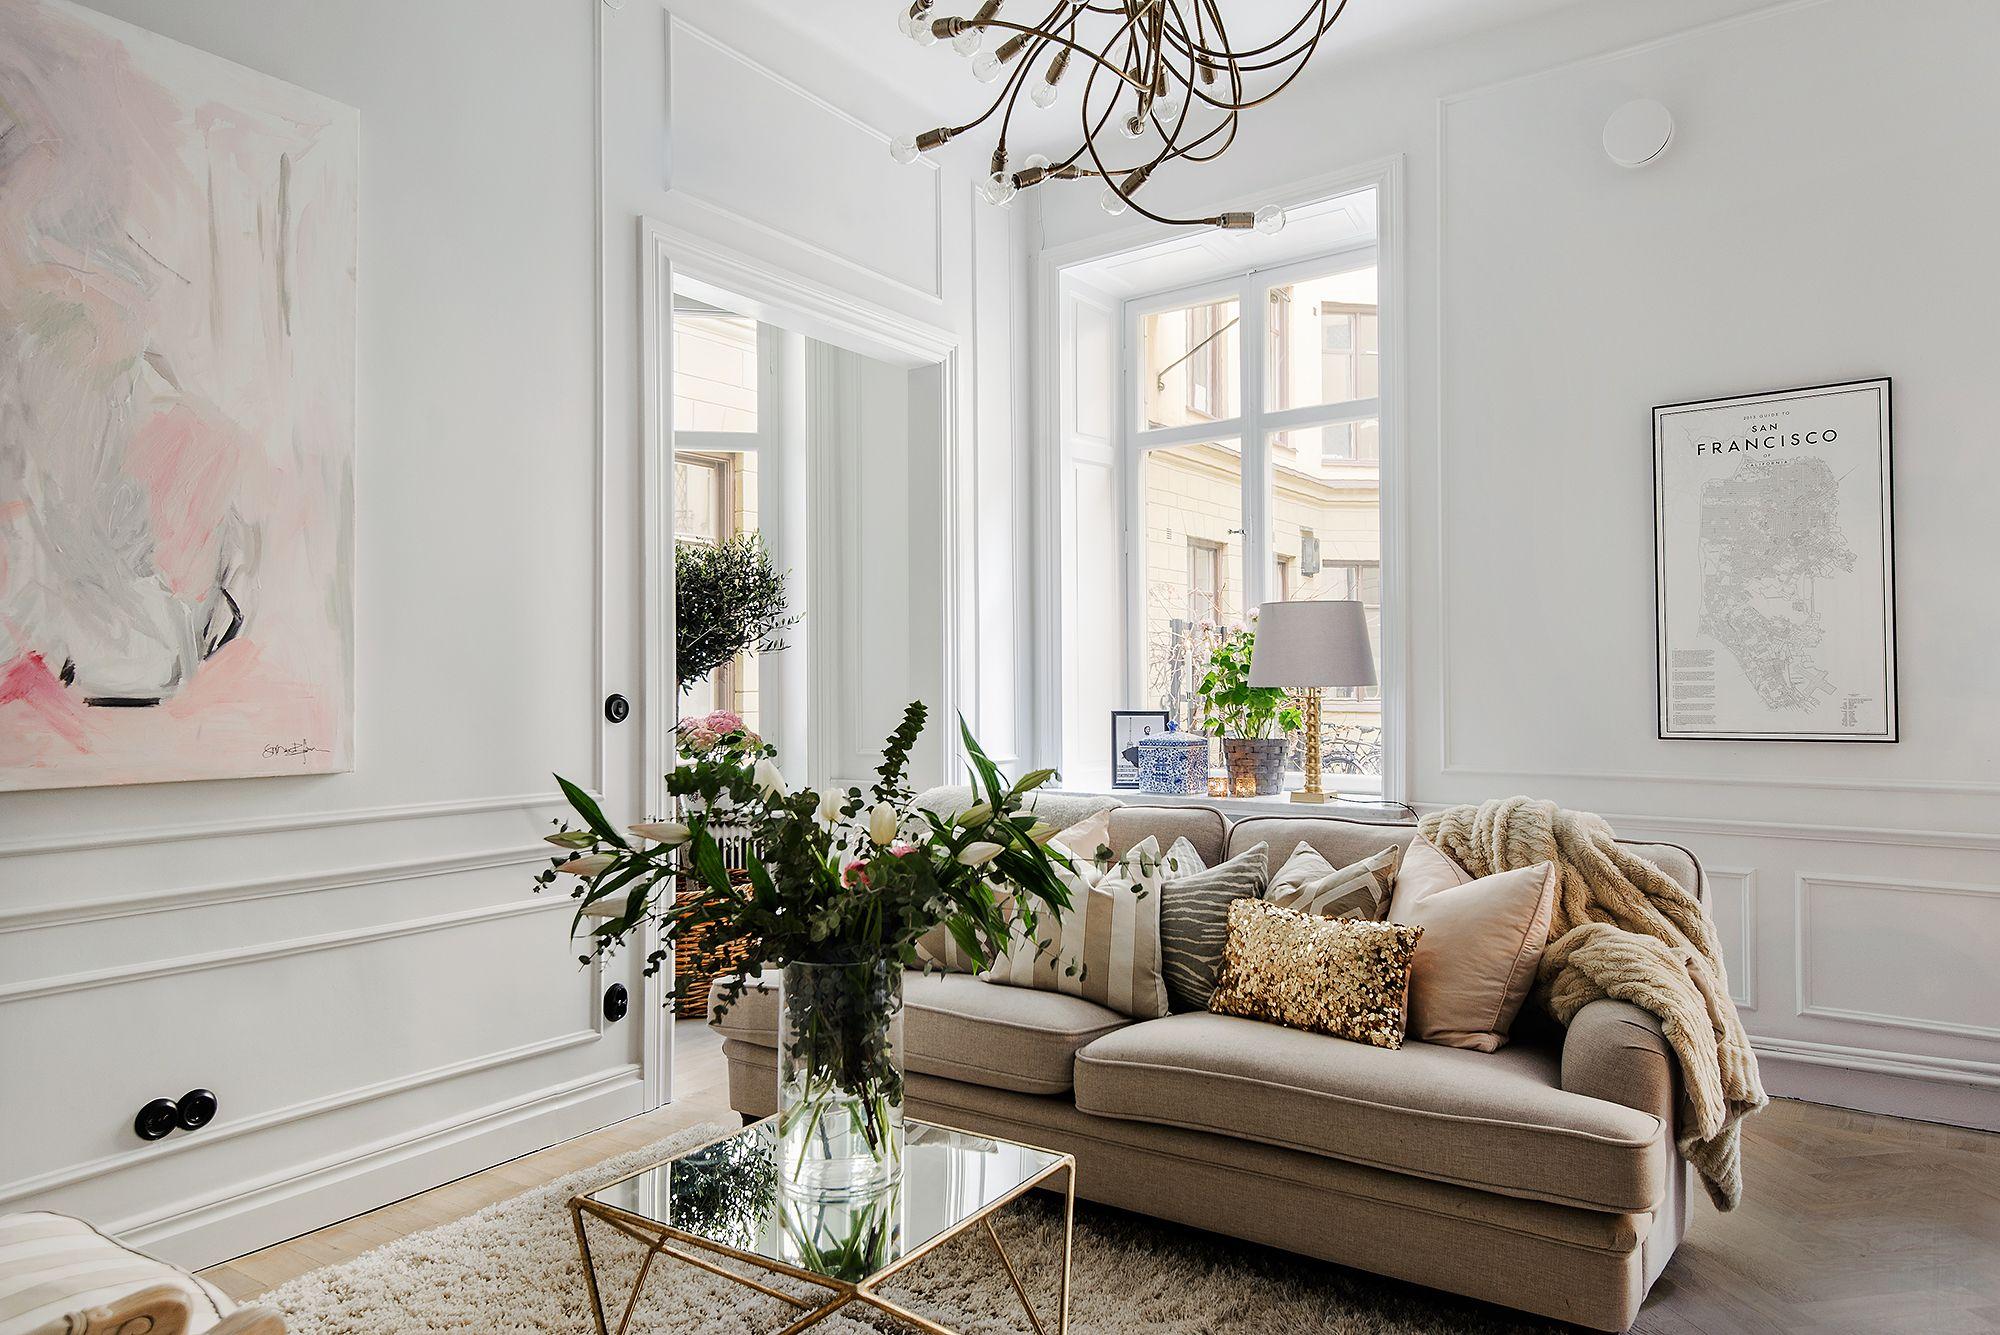 Grevgatan 20 Stockholm For Sale At Innerstadsspecialisten Interior Decorater Sophia Bjrnsdotter